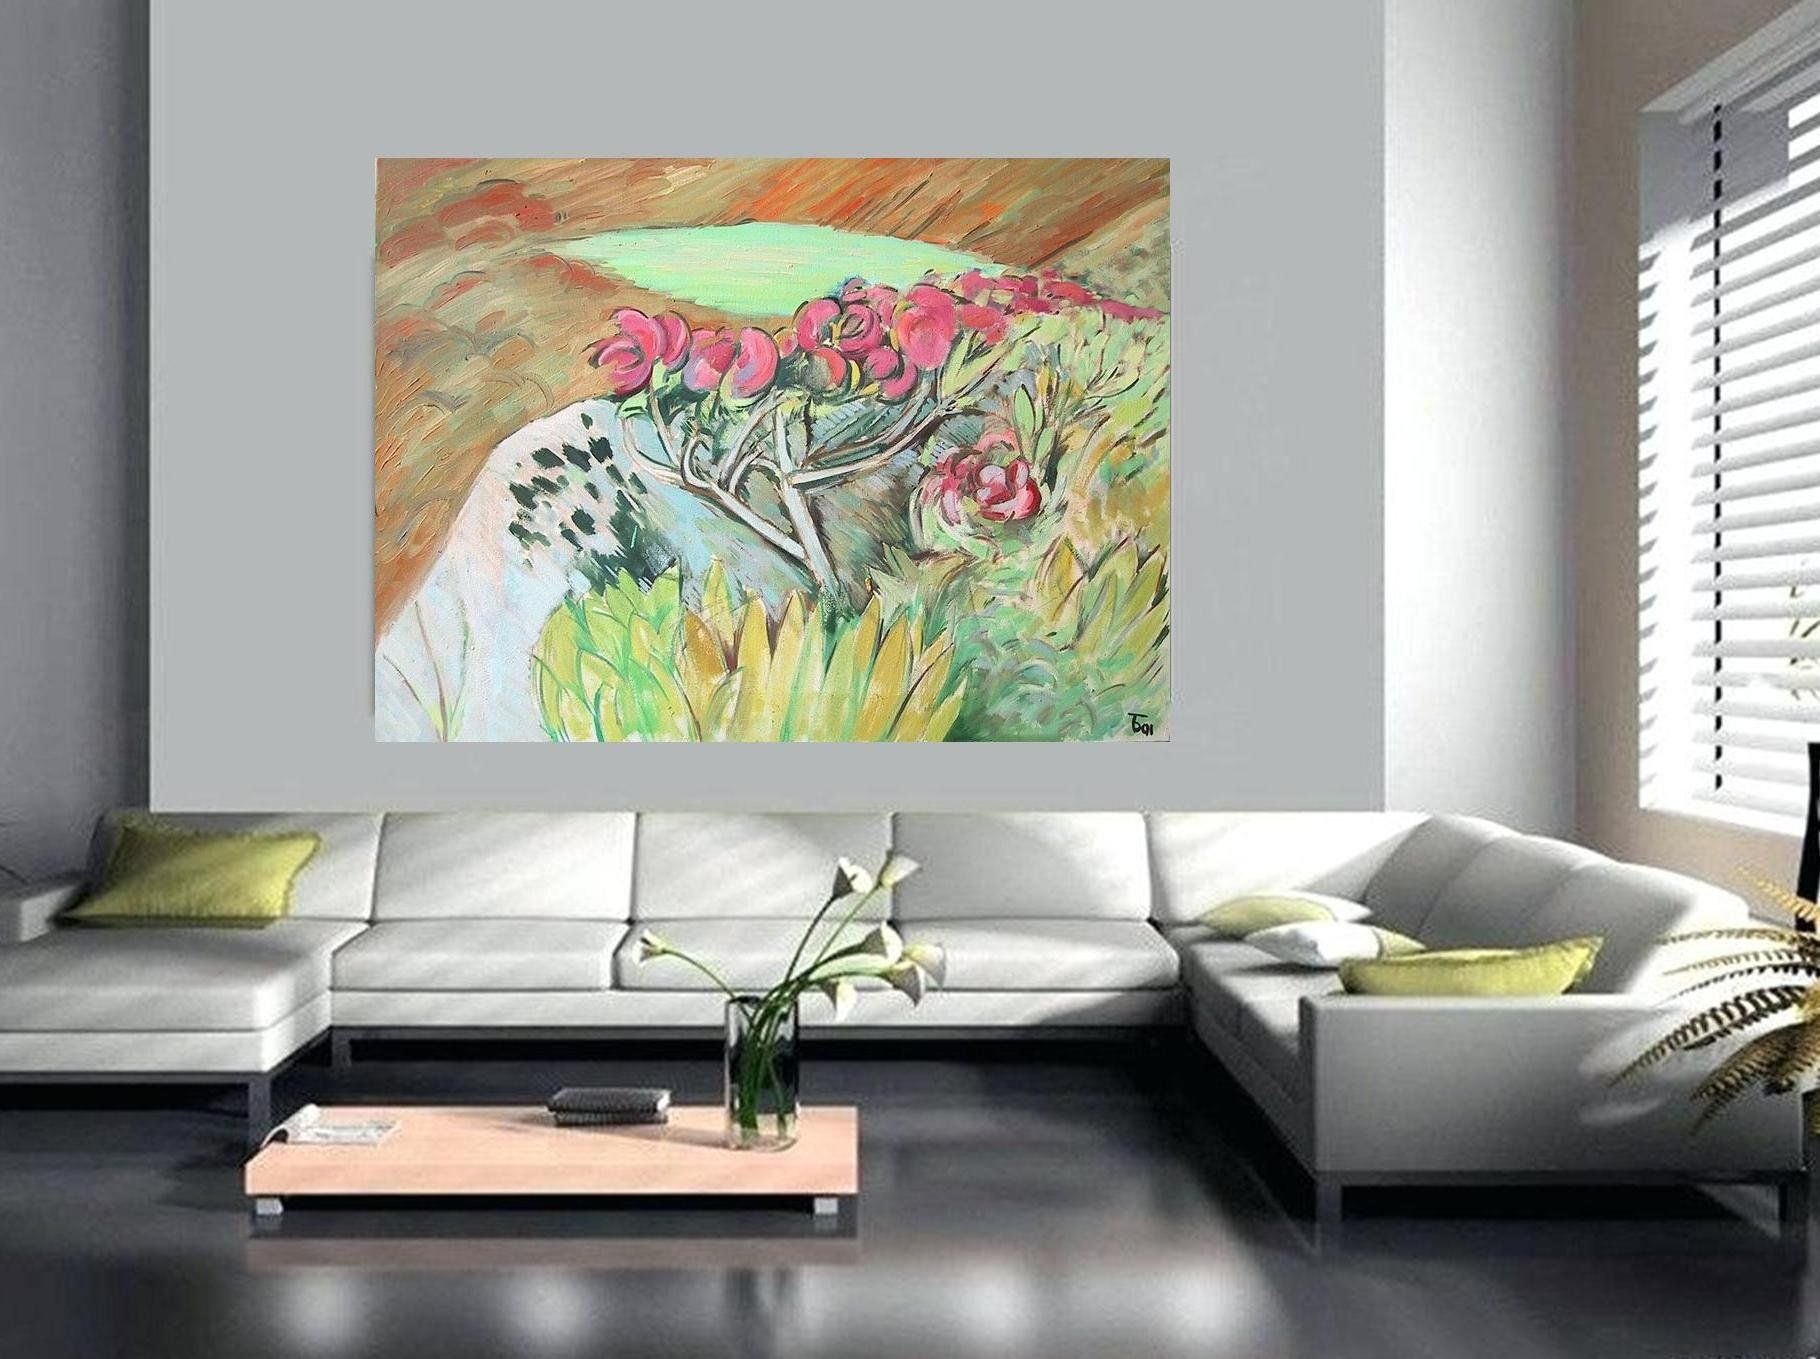 Extra large long horizontal wall artyellow green wall decor art